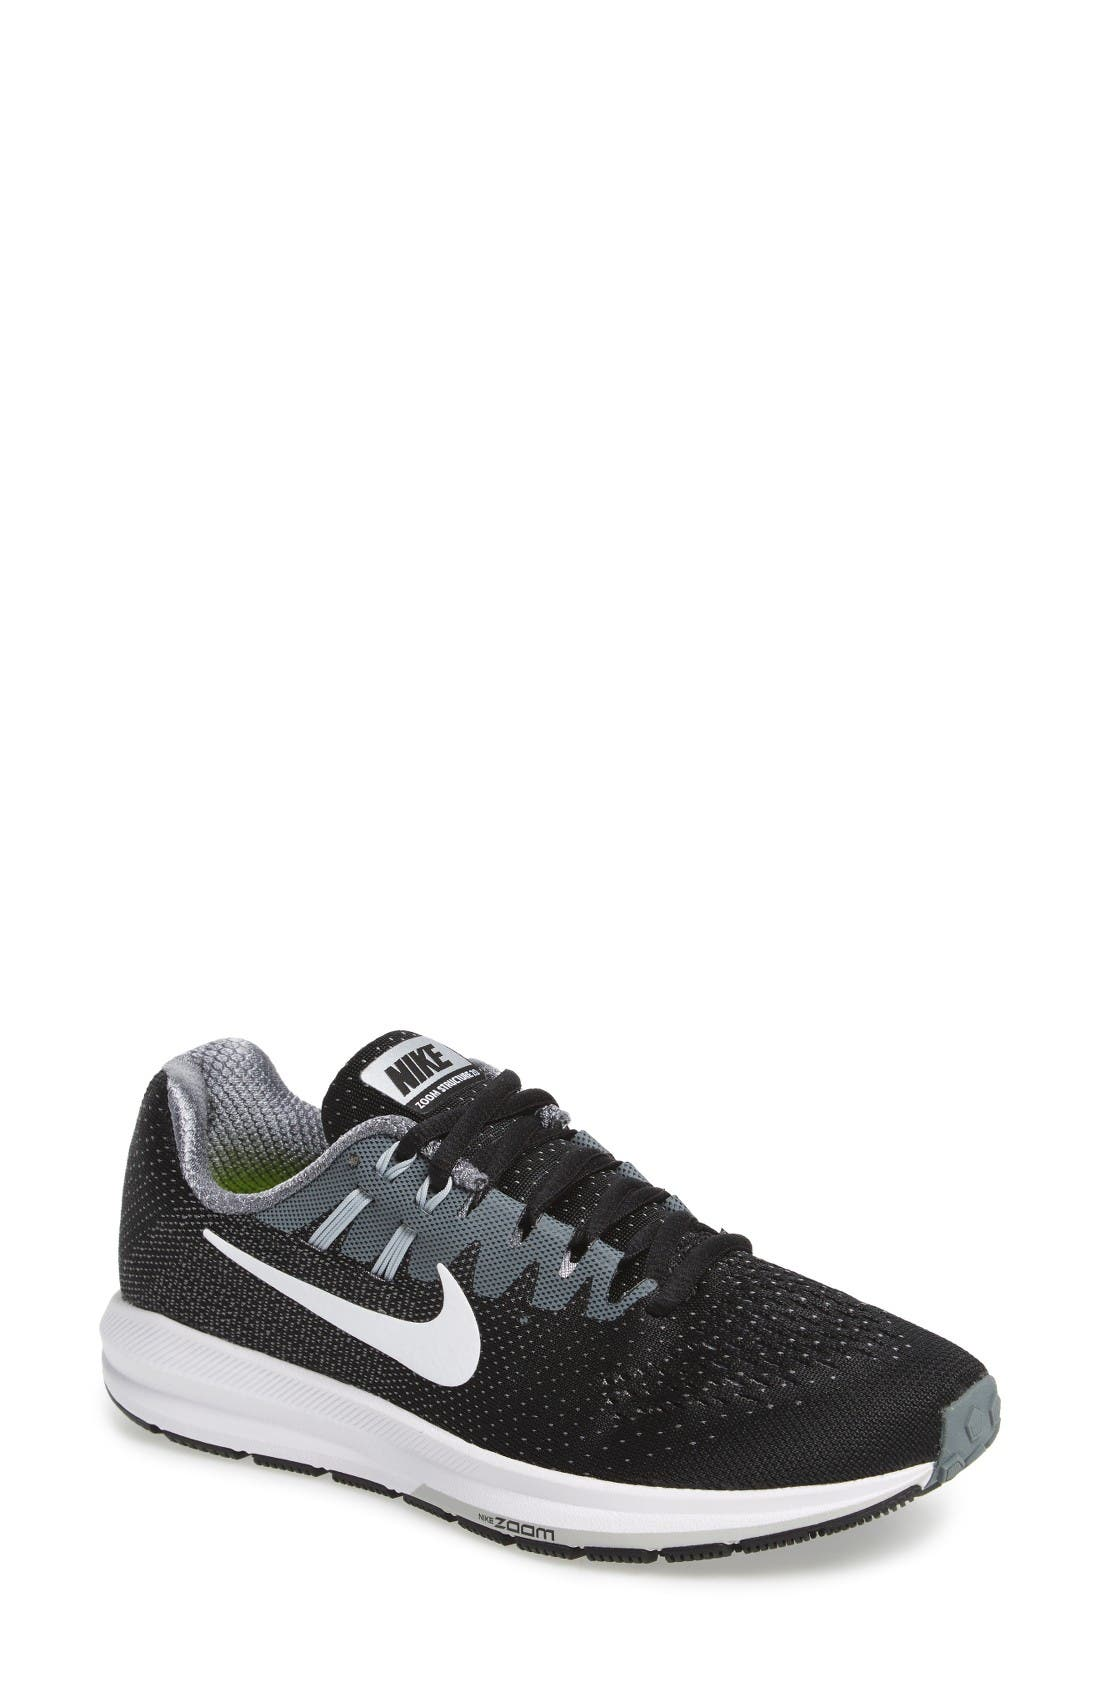 Main Image - Nike Air Zoom Structure 20 Running Shoe (Women)